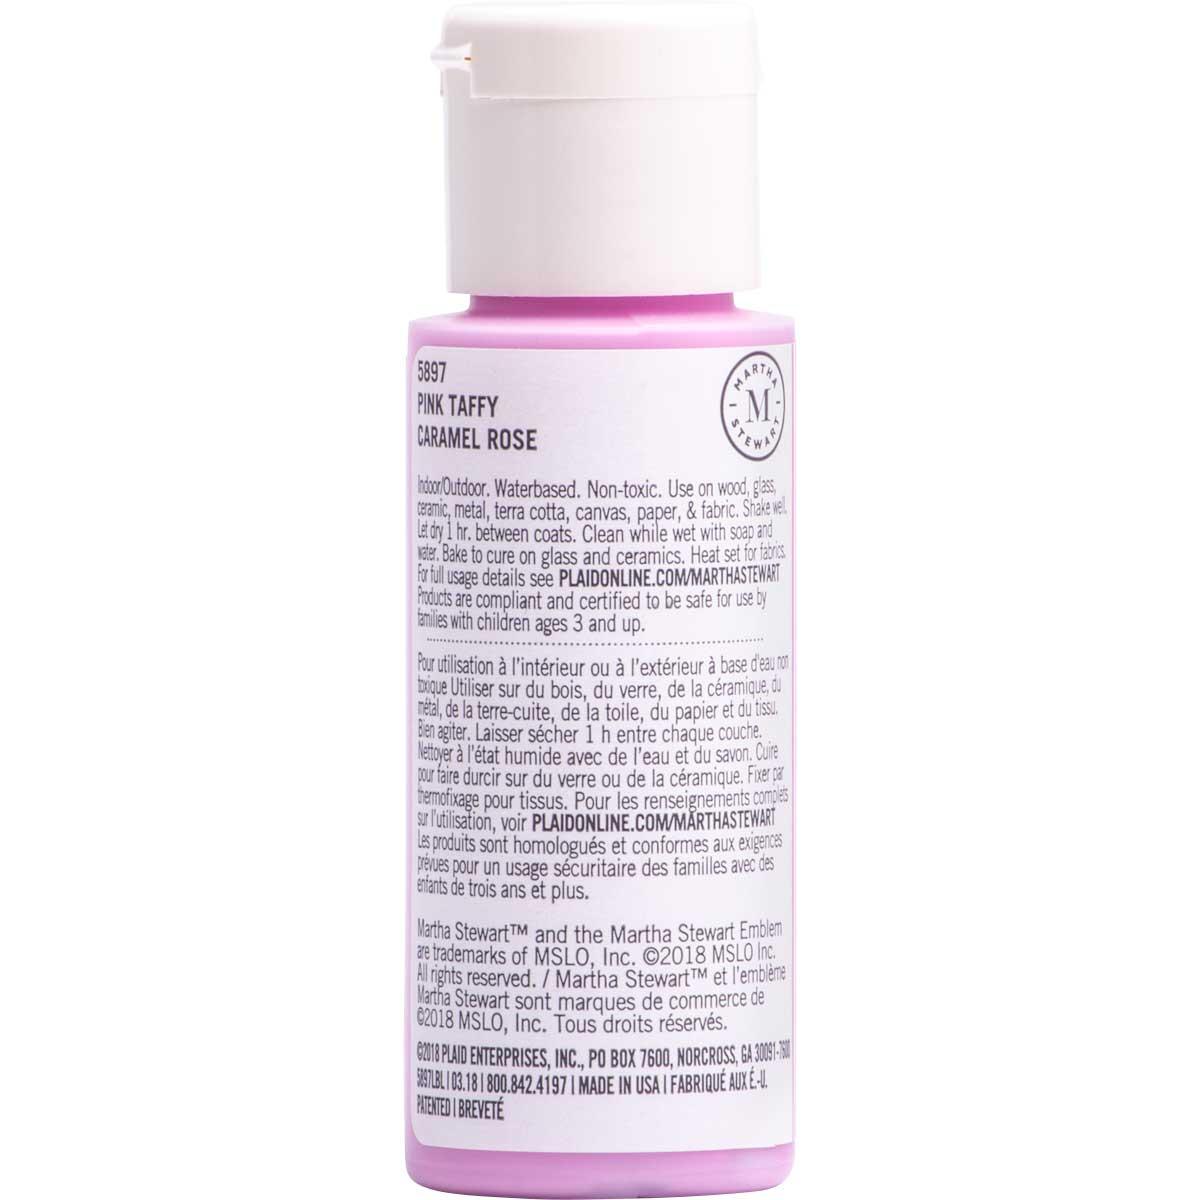 Martha Stewart ® Multi-Surface Satin Acrylic Craft Paint CPSIA - Pink Taffy, 2 oz. - 5897